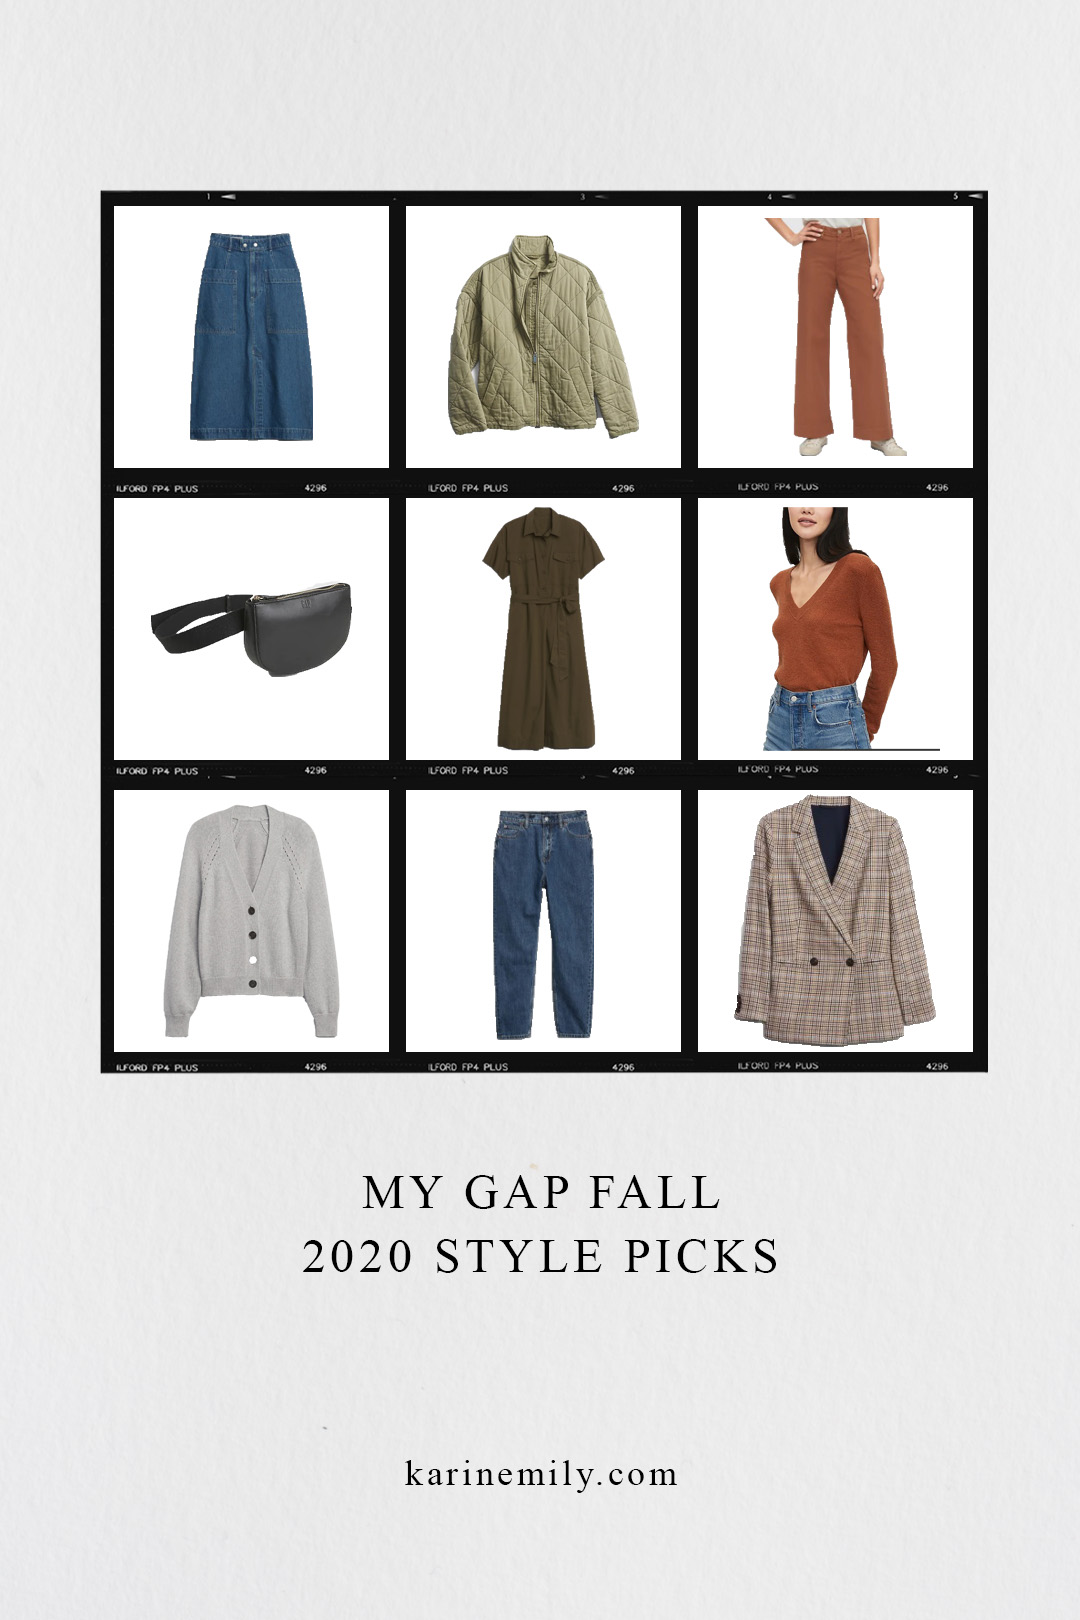 My Gap Fall 2020 Style Picks